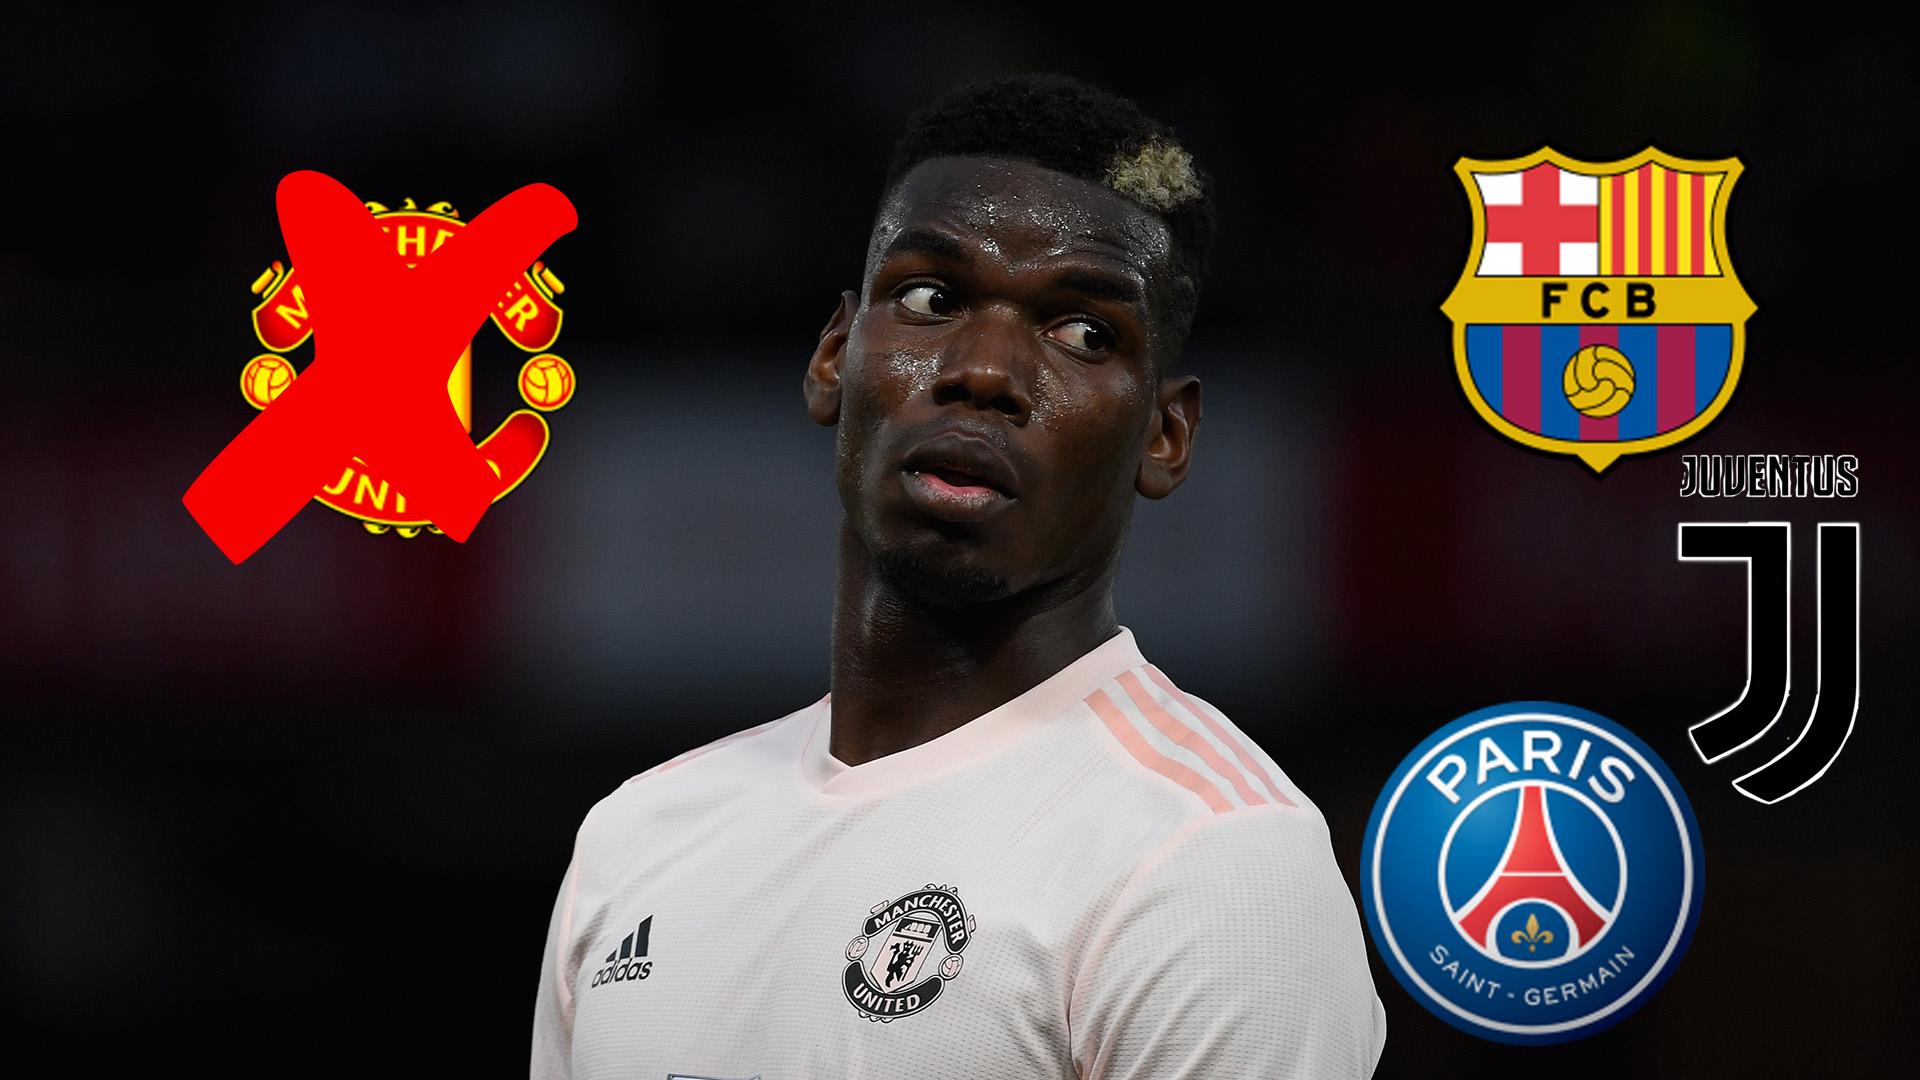 Will Paul Pogba Leave Man Utd In January Barcelona Juventus Psg And Transfer Options For Midfielder Goal Com